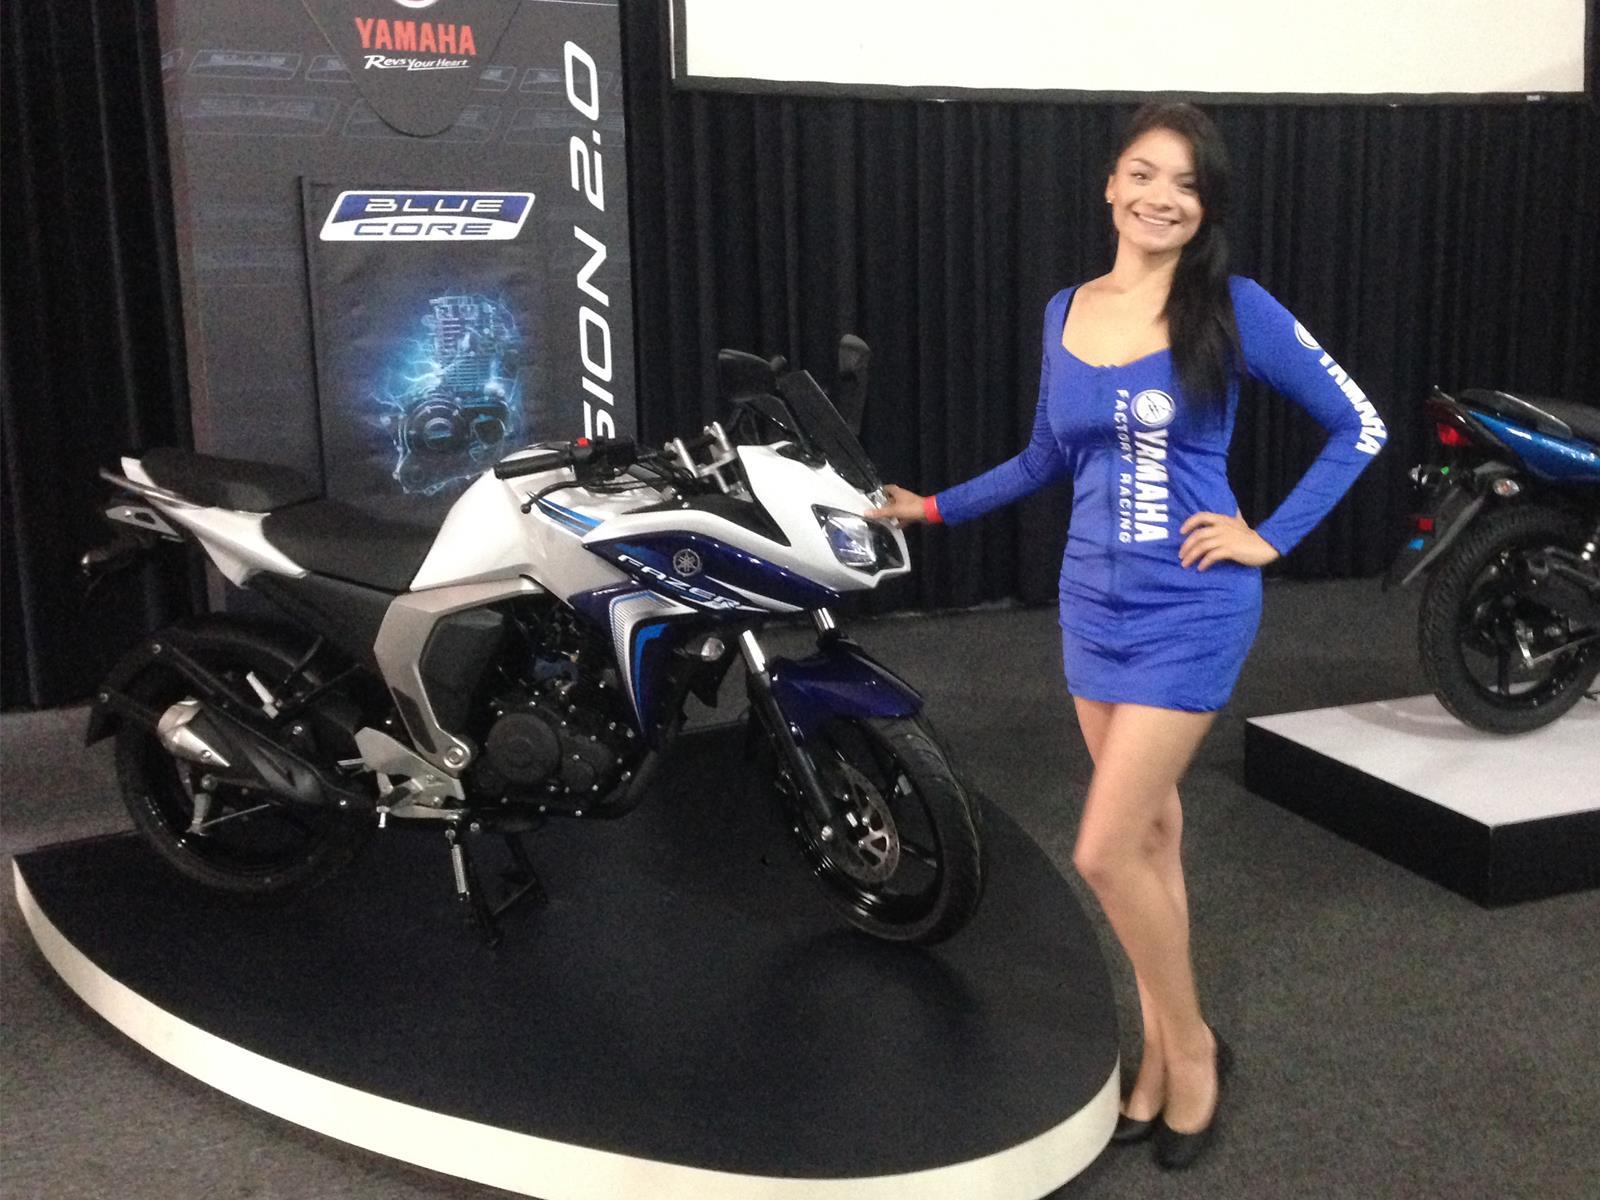 Yamaha Fz 2016 Llega A M 233 Xico En 34 990 Pesos